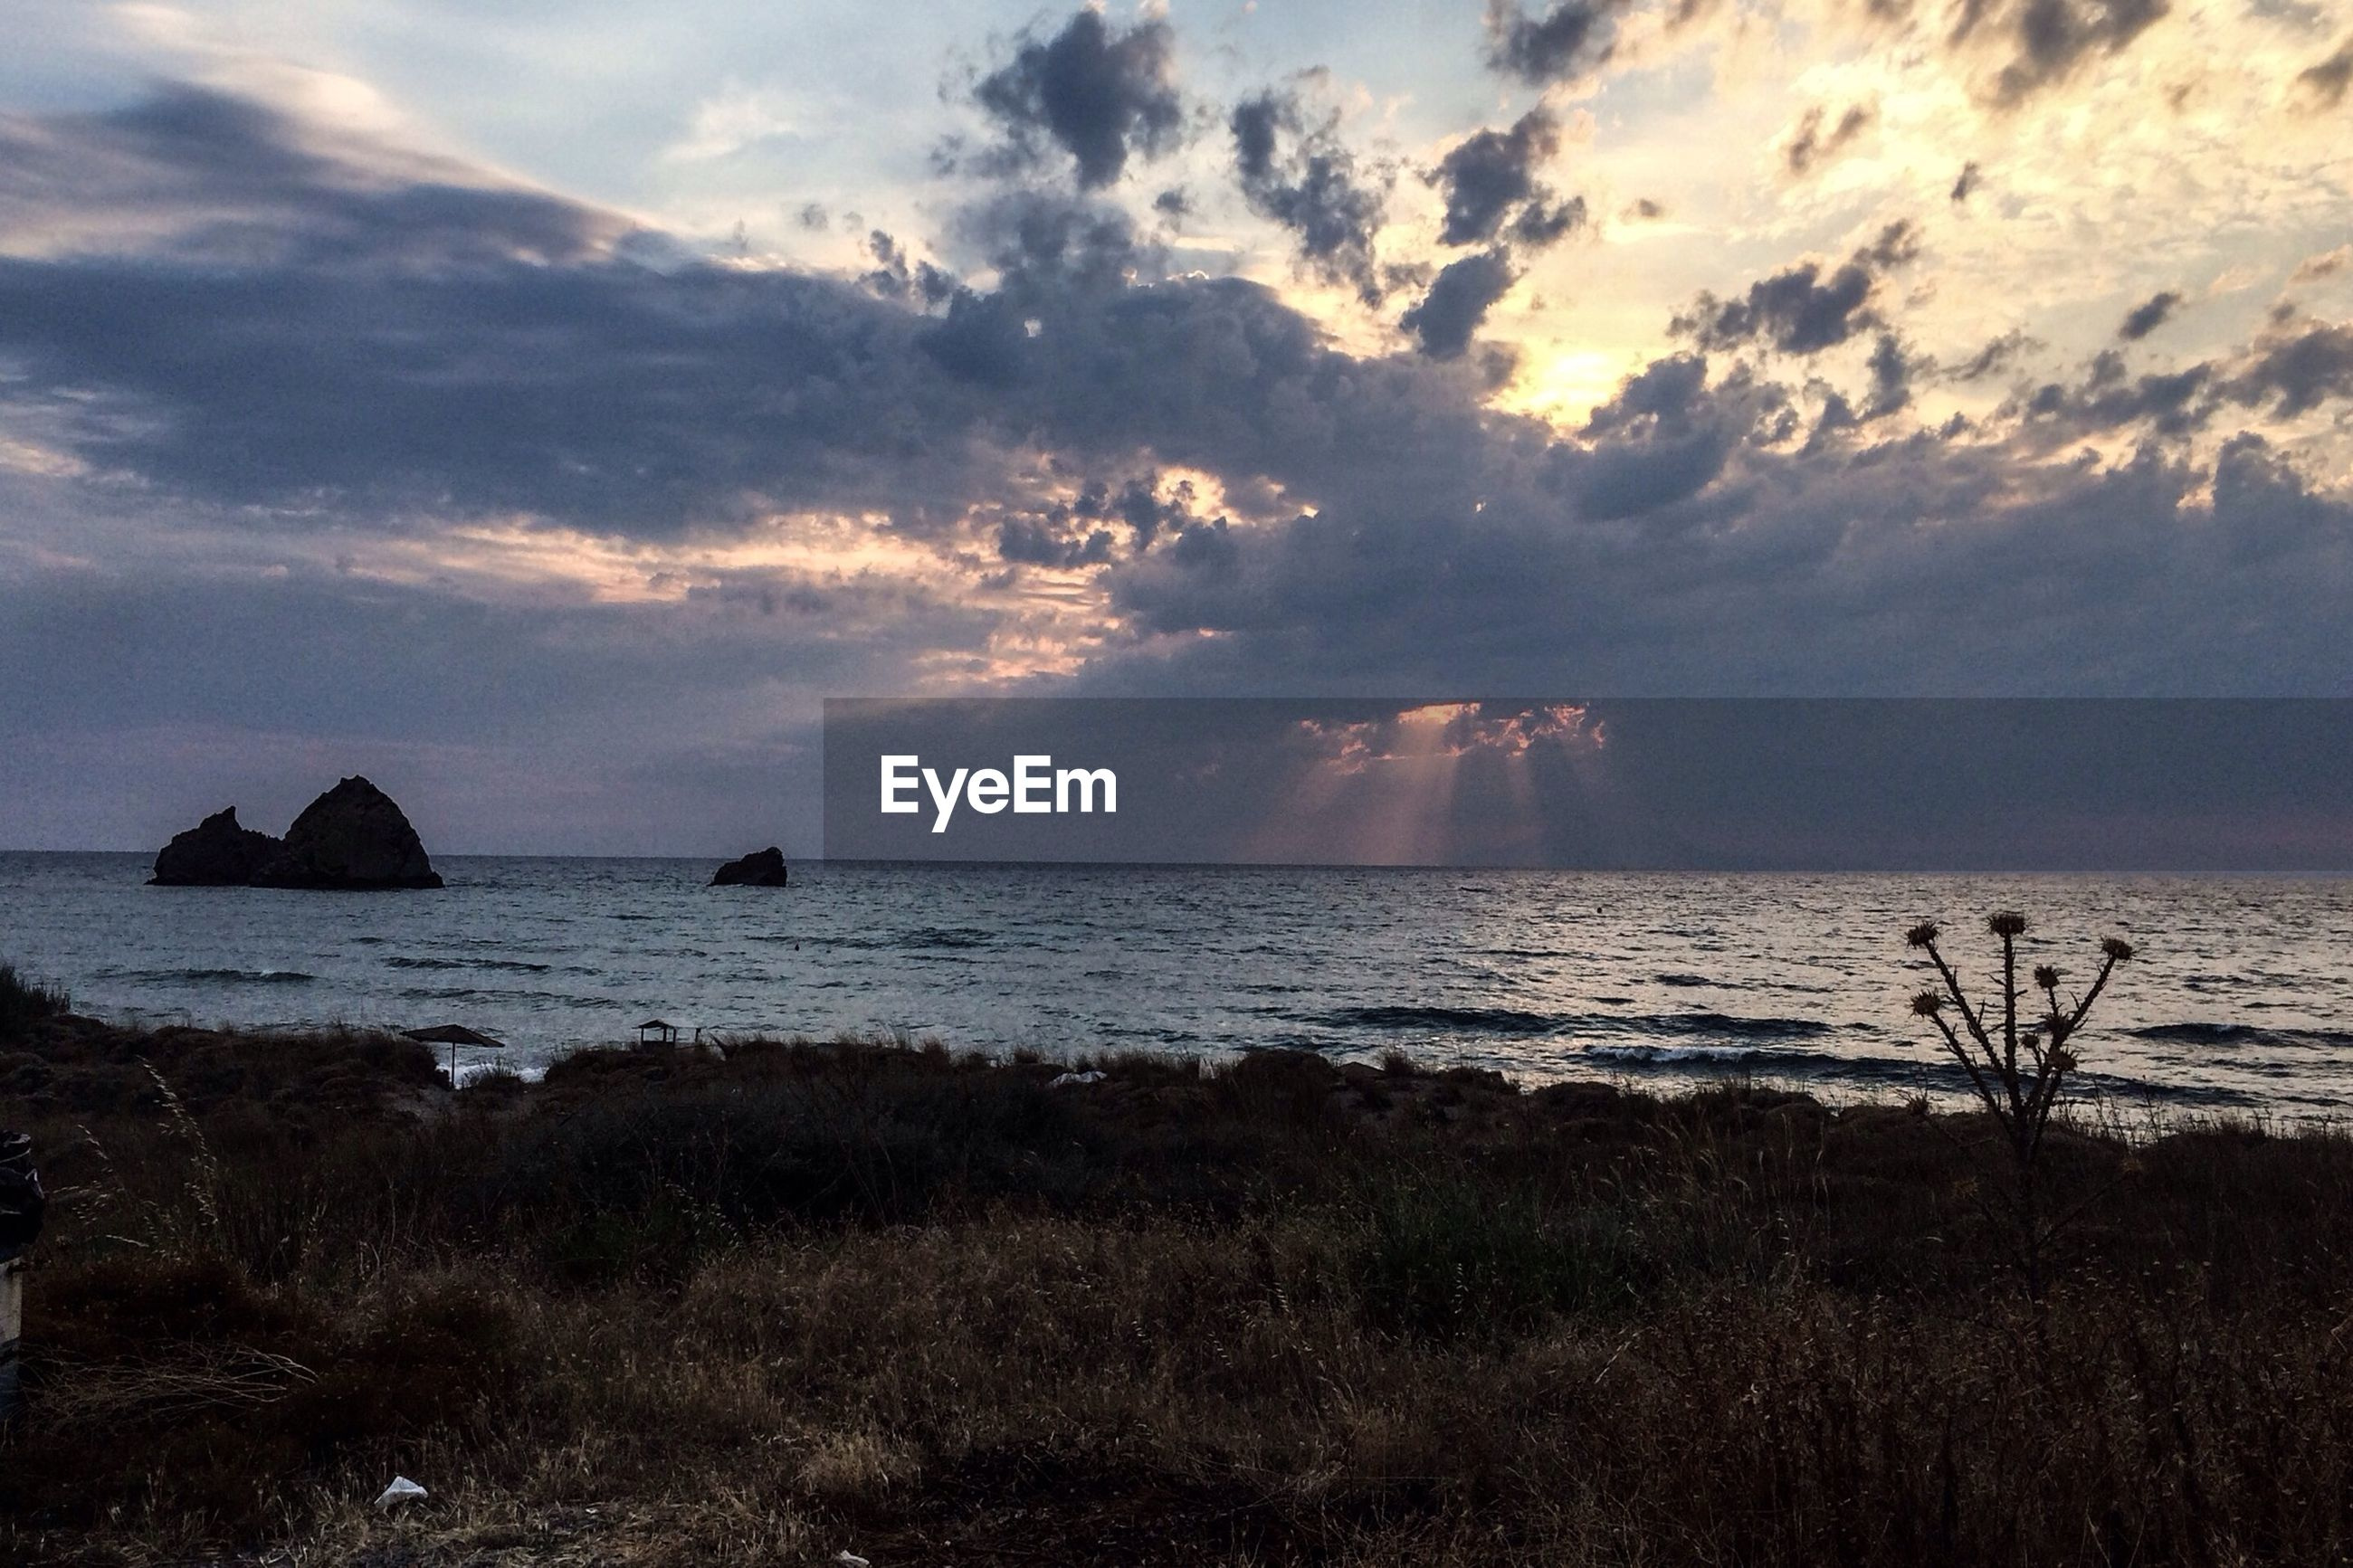 sea, sky, horizon over water, water, tranquil scene, scenics, tranquility, beauty in nature, beach, cloud - sky, sunset, shore, nature, idyllic, cloud, sun, cloudy, non-urban scene, silhouette, remote